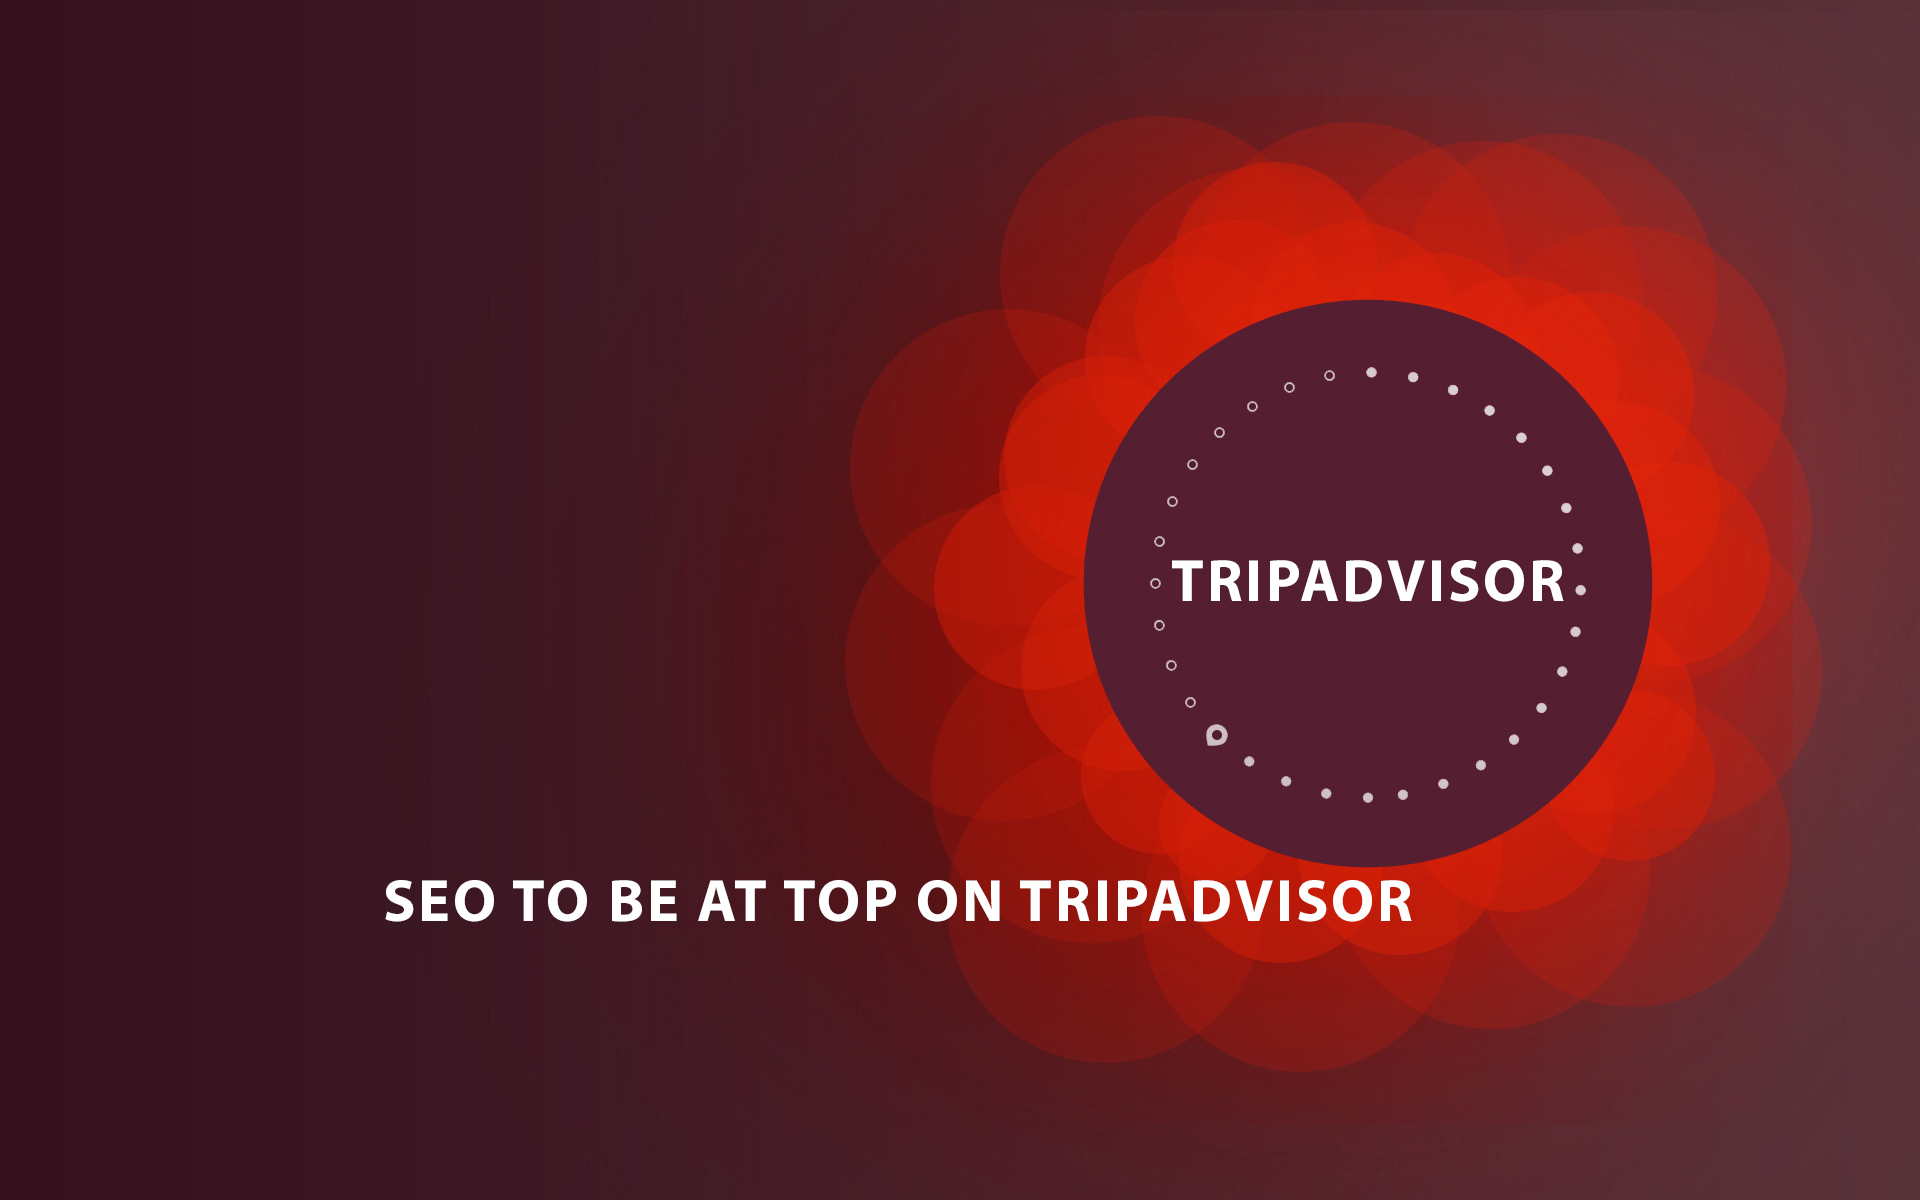 SEO to be at top on TripAdvisor